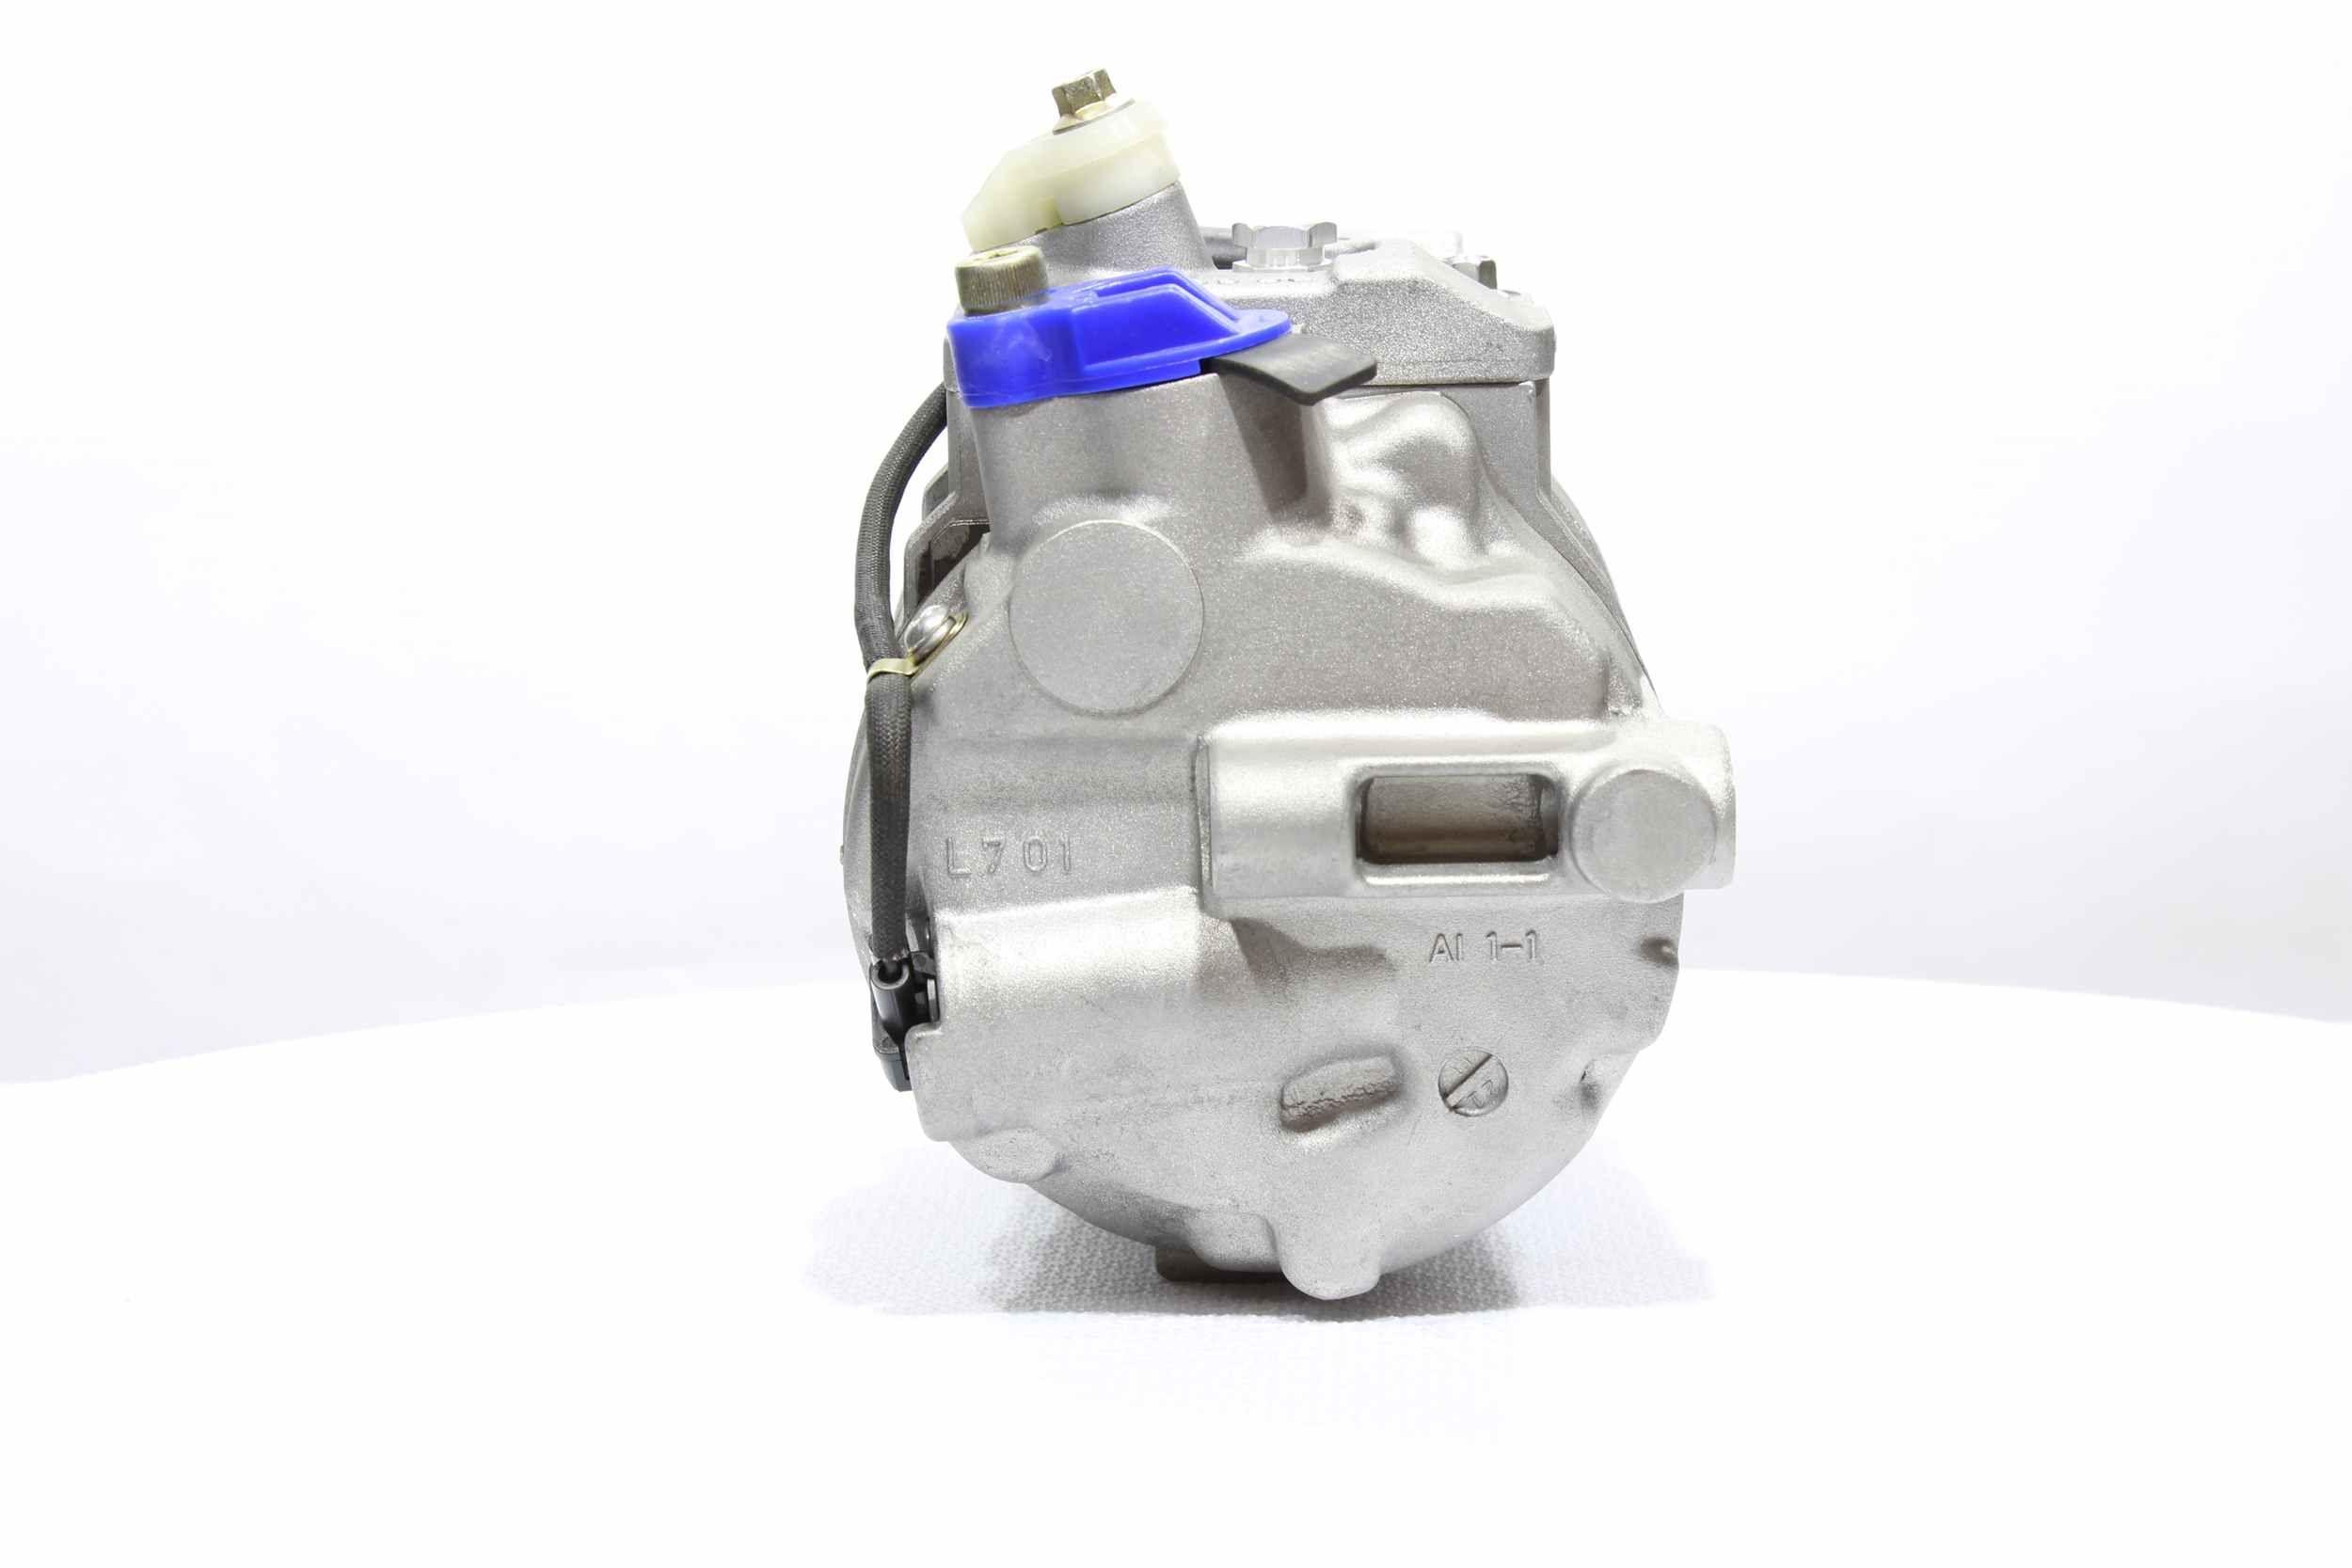 10550536 Kompressor, Klimaanlage ALANKO 550536 - Große Auswahl - stark reduziert